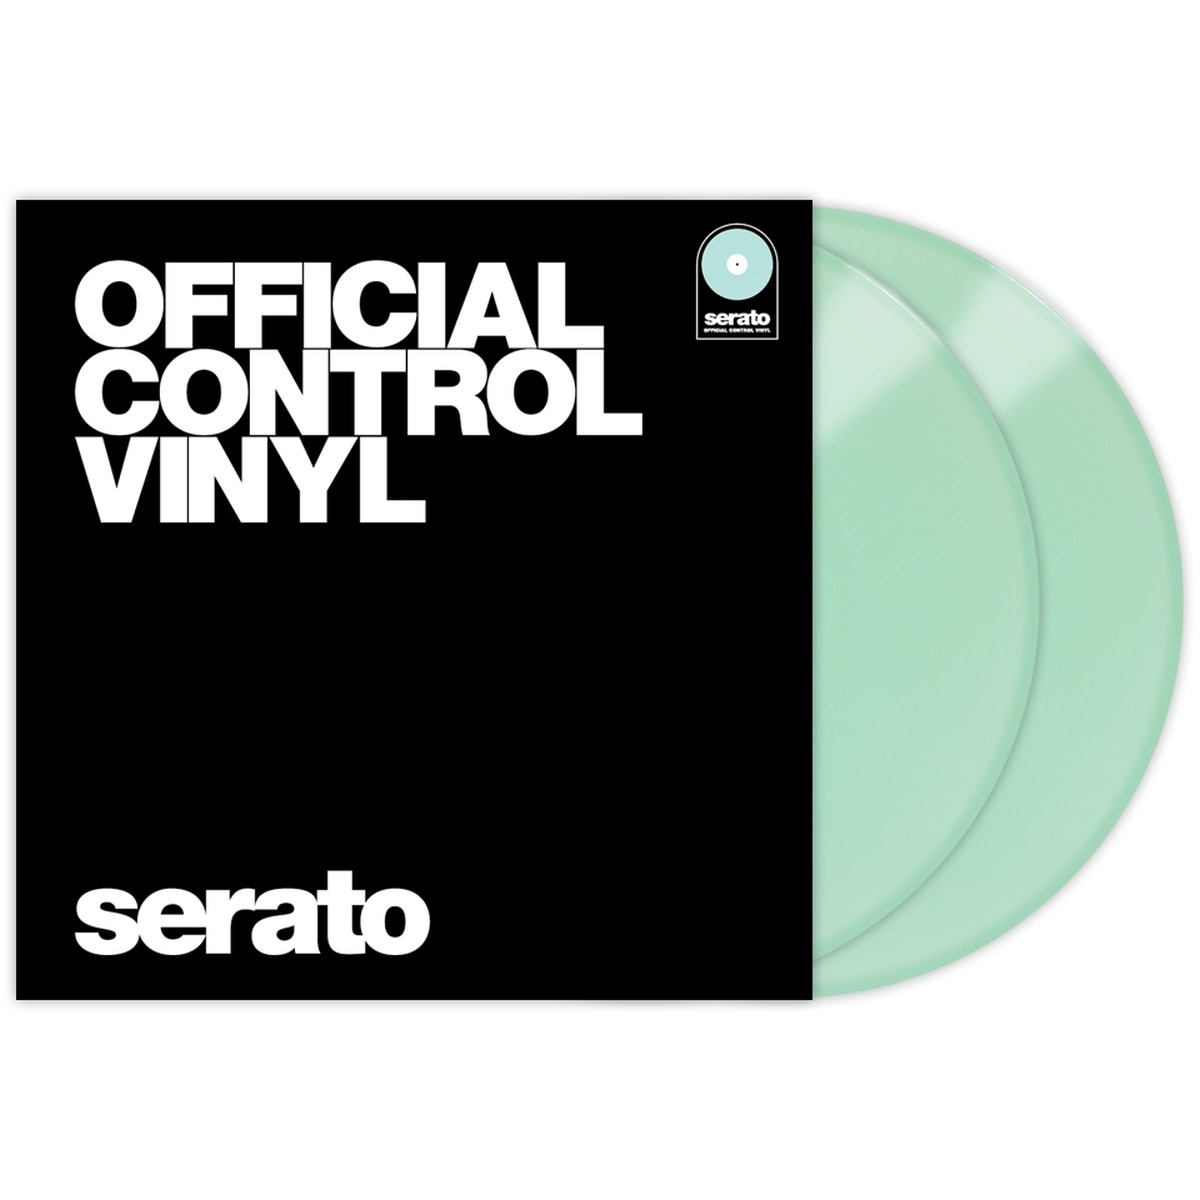 Serato Ersatz Vinyl Performance Glow In The Dark